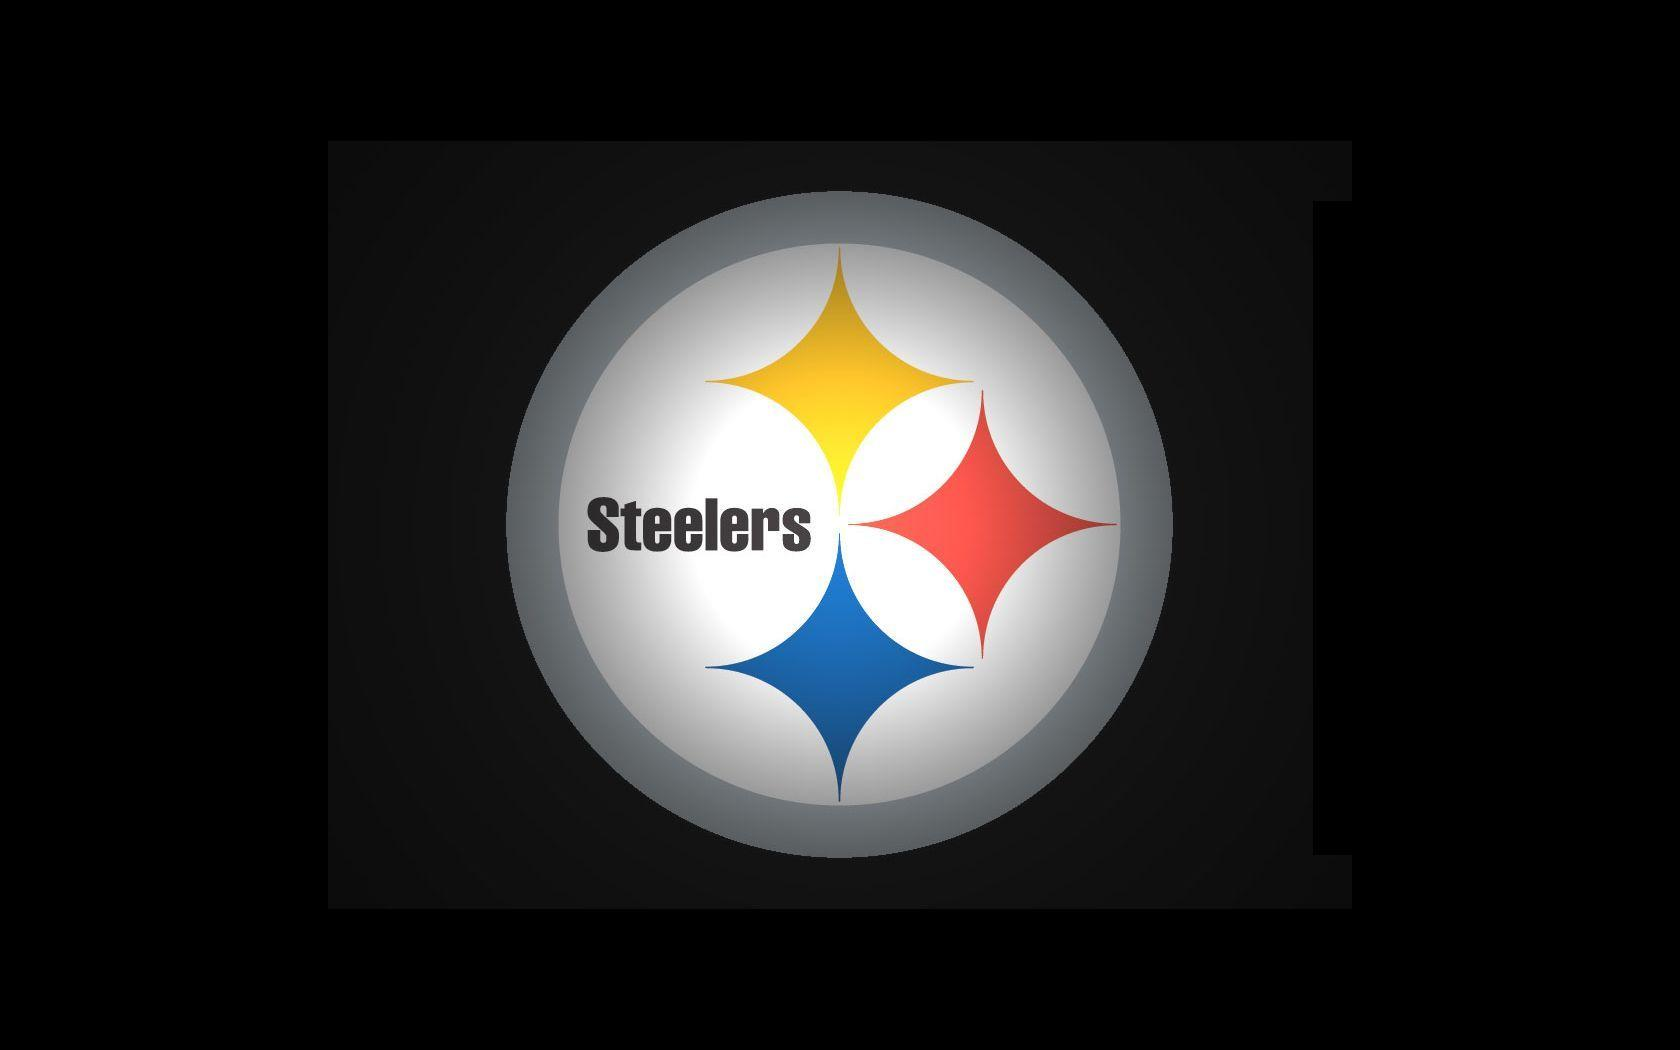 Pittsburgh Steelers Wallpapers - Top